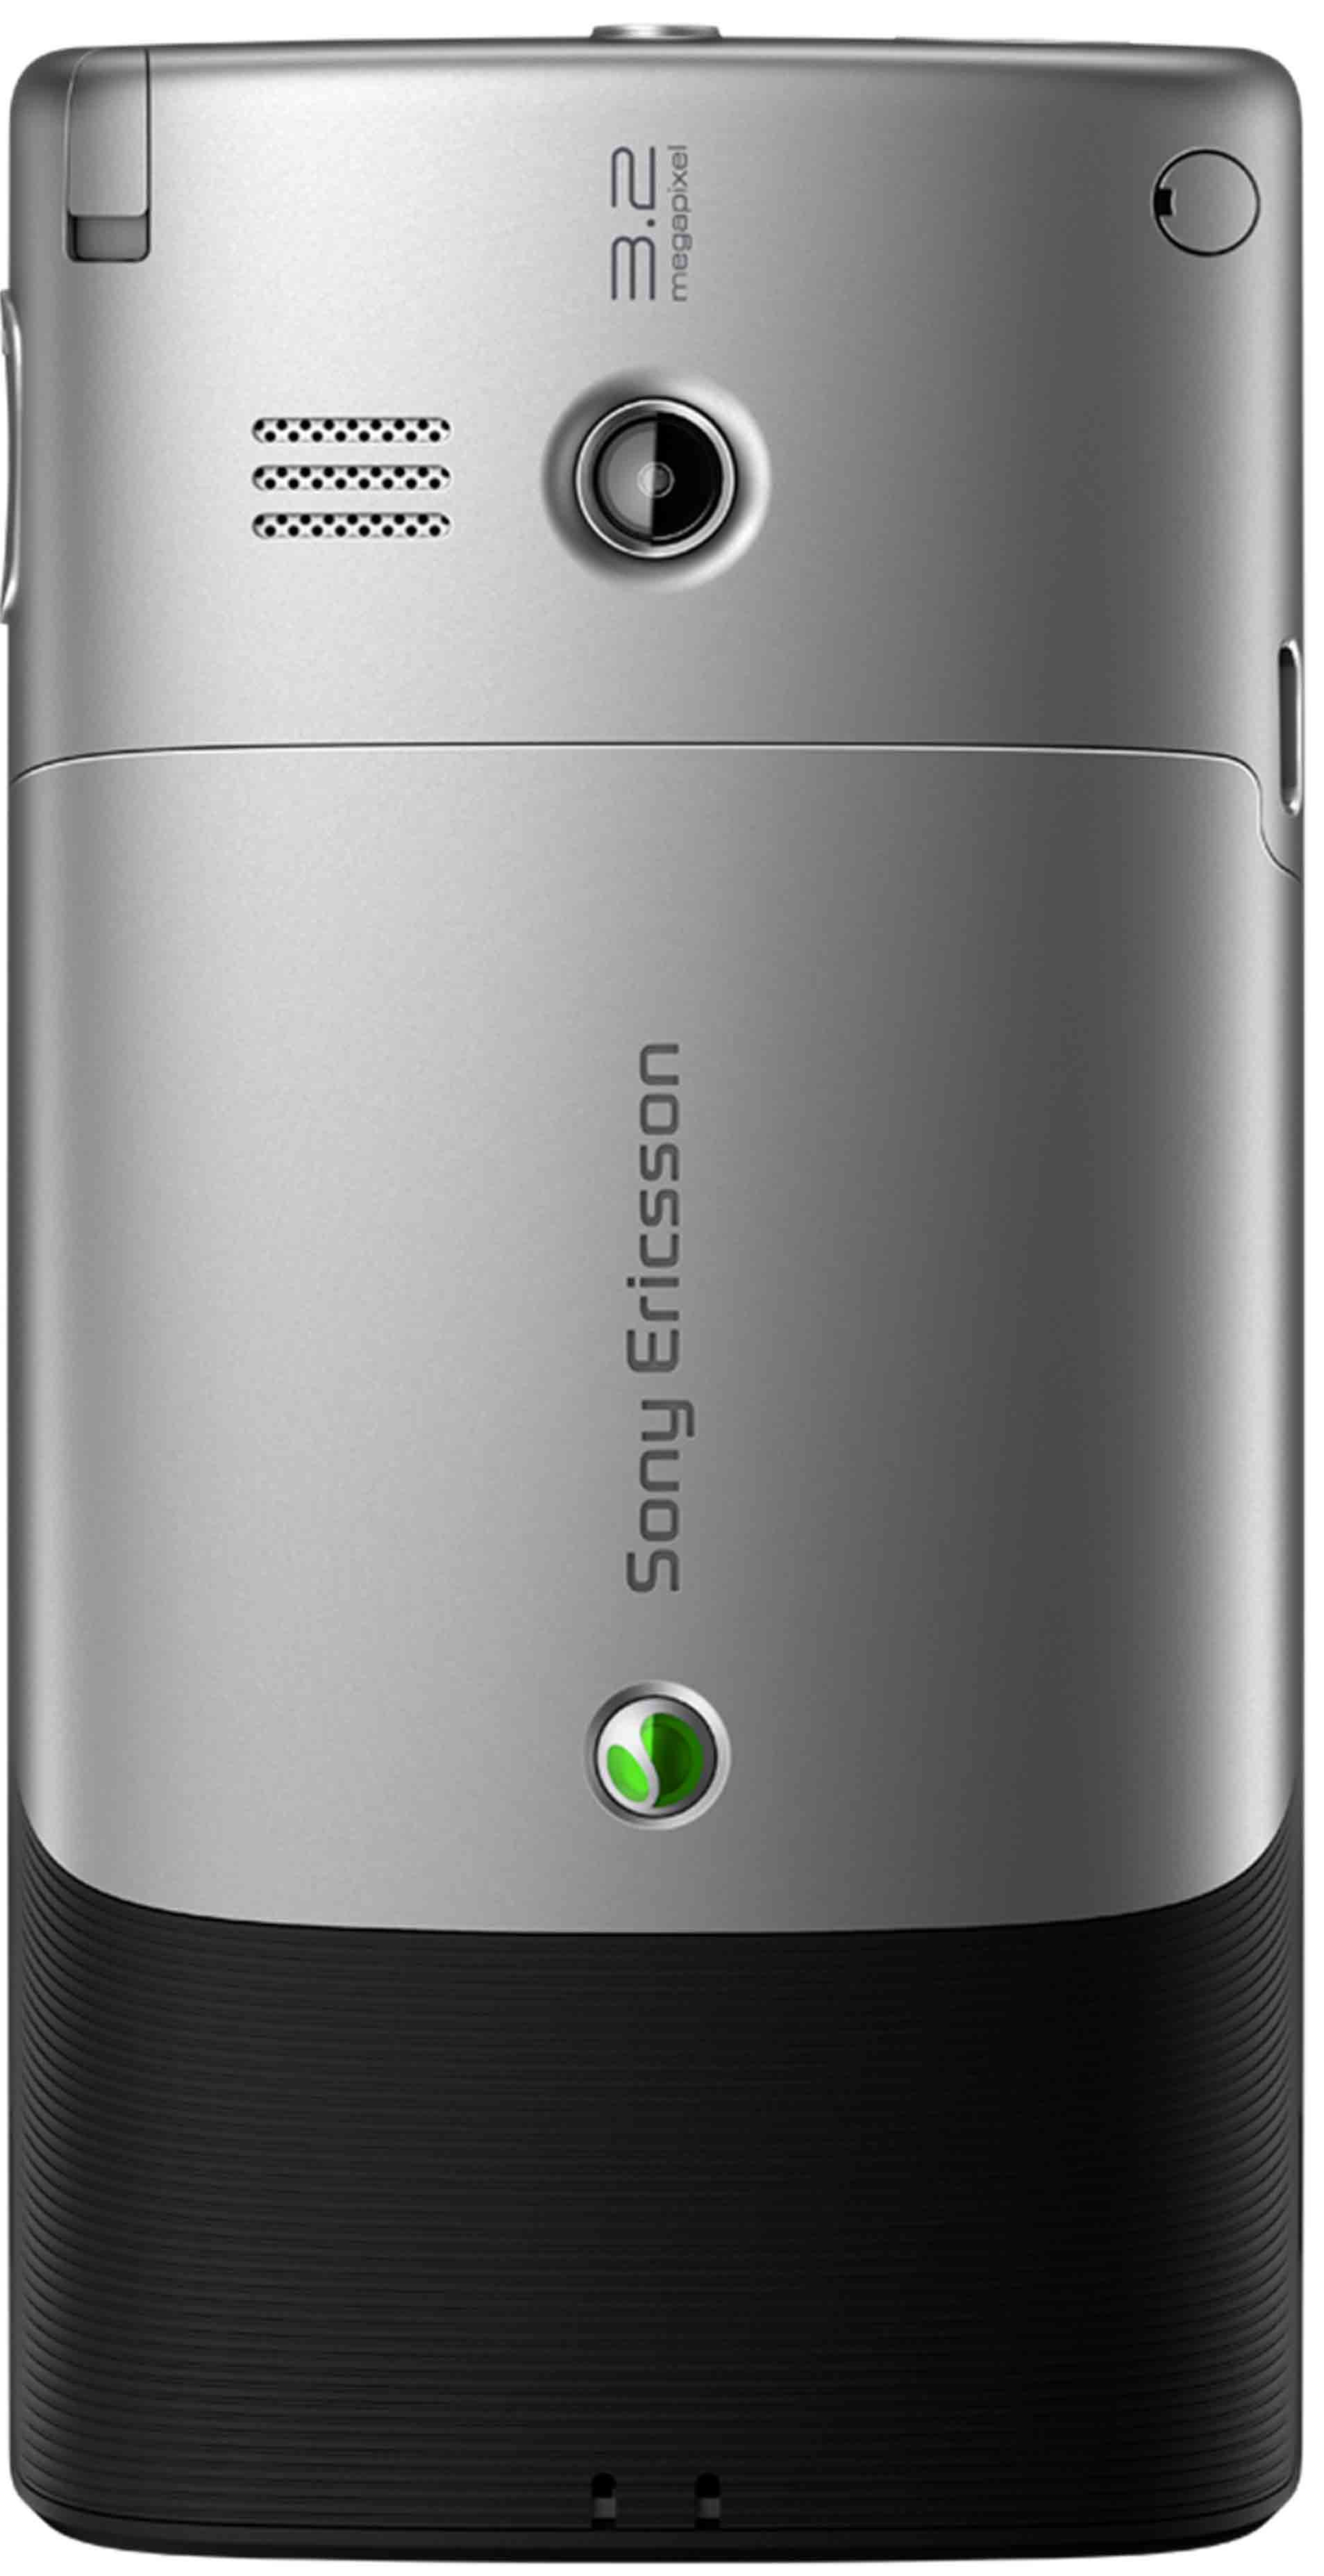 Sony Ericsson Aspen M1i Iconic Black AZERTY